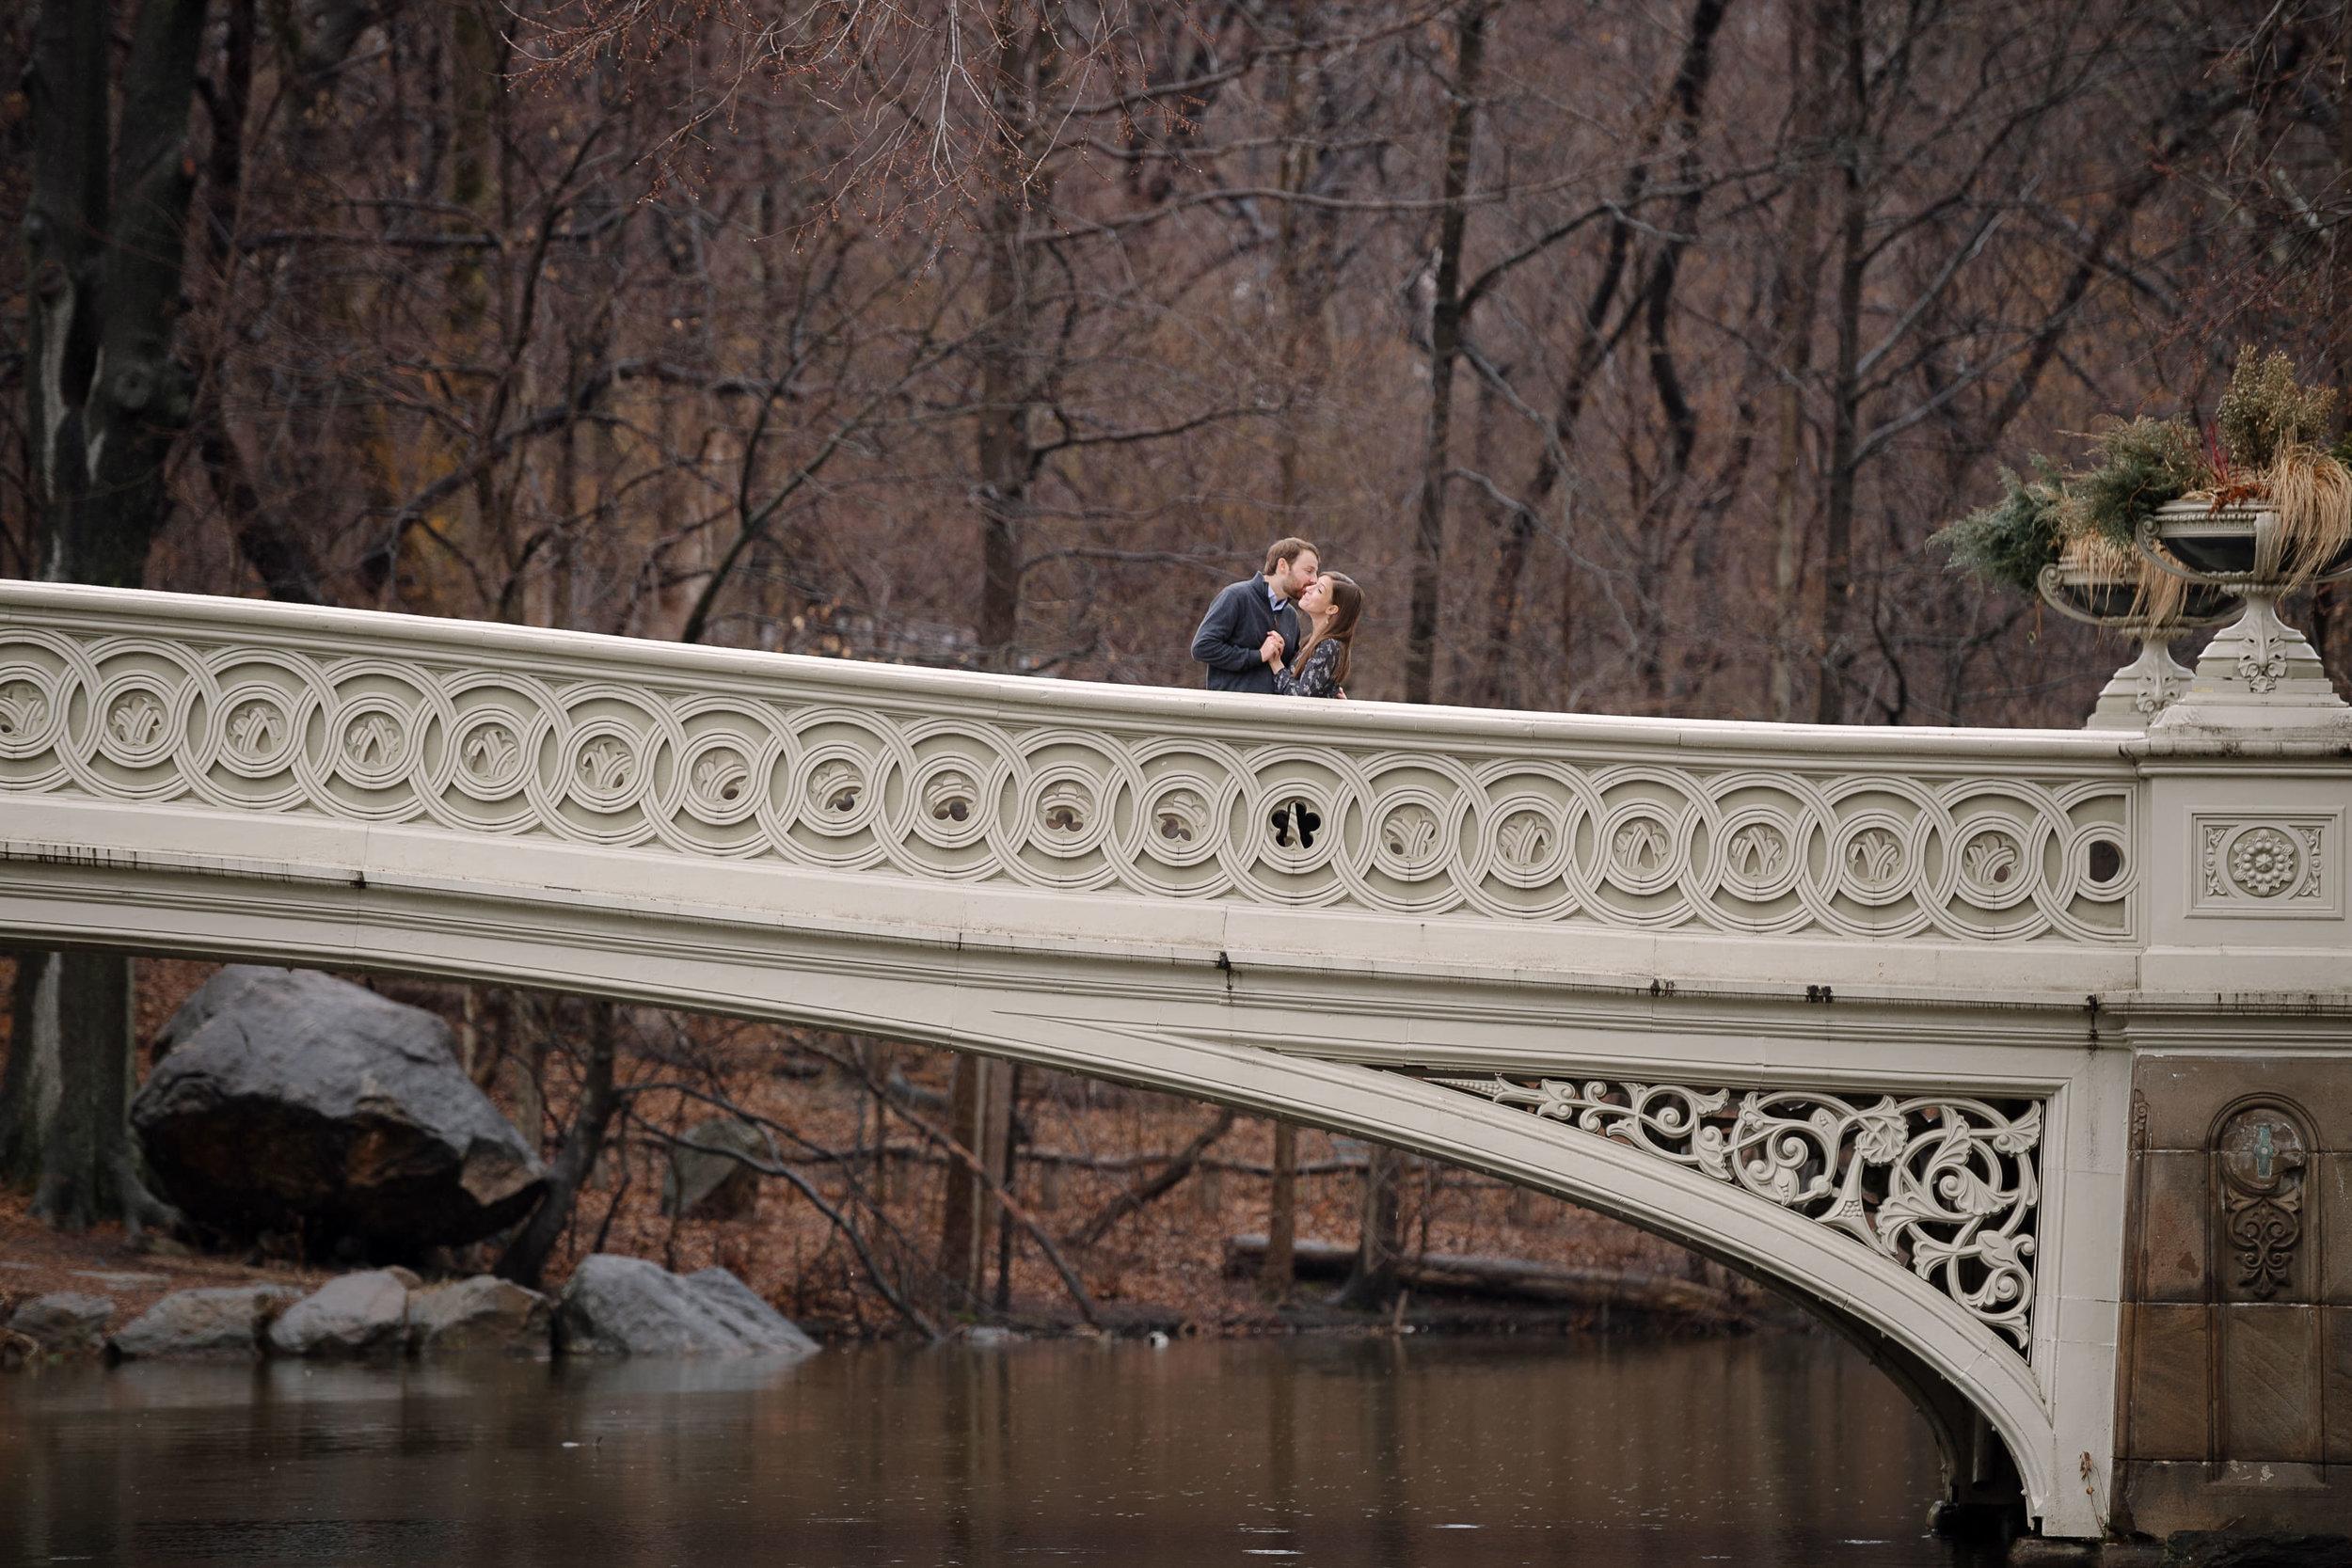 Central Park New York City Engagement Session